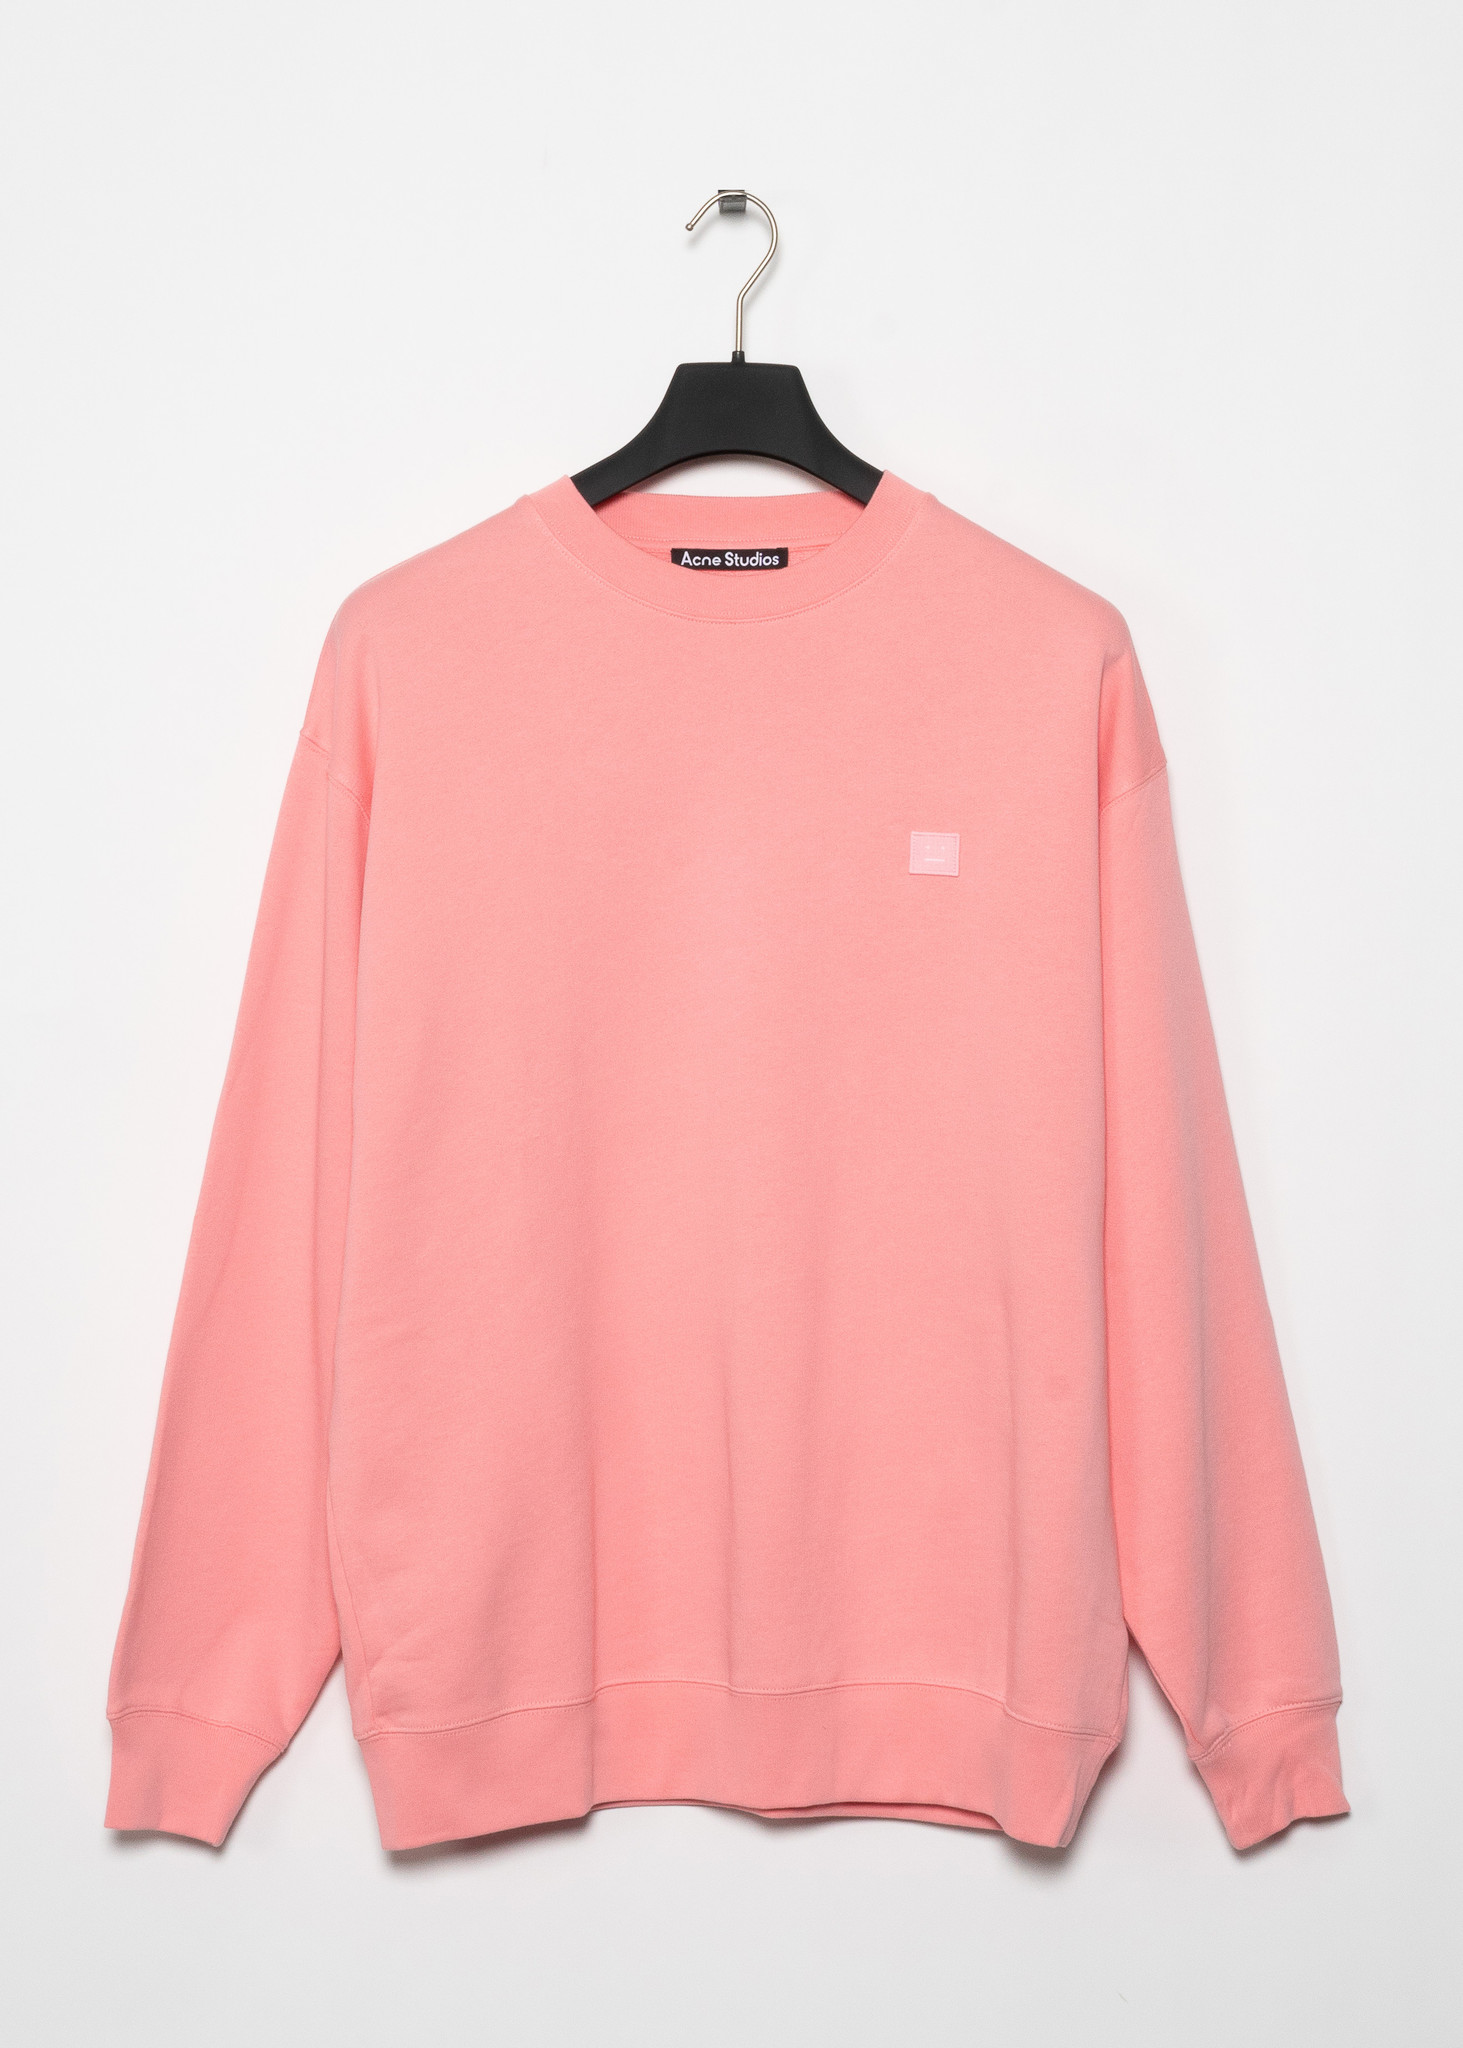 Blush Pink Oversized Sweatshirt